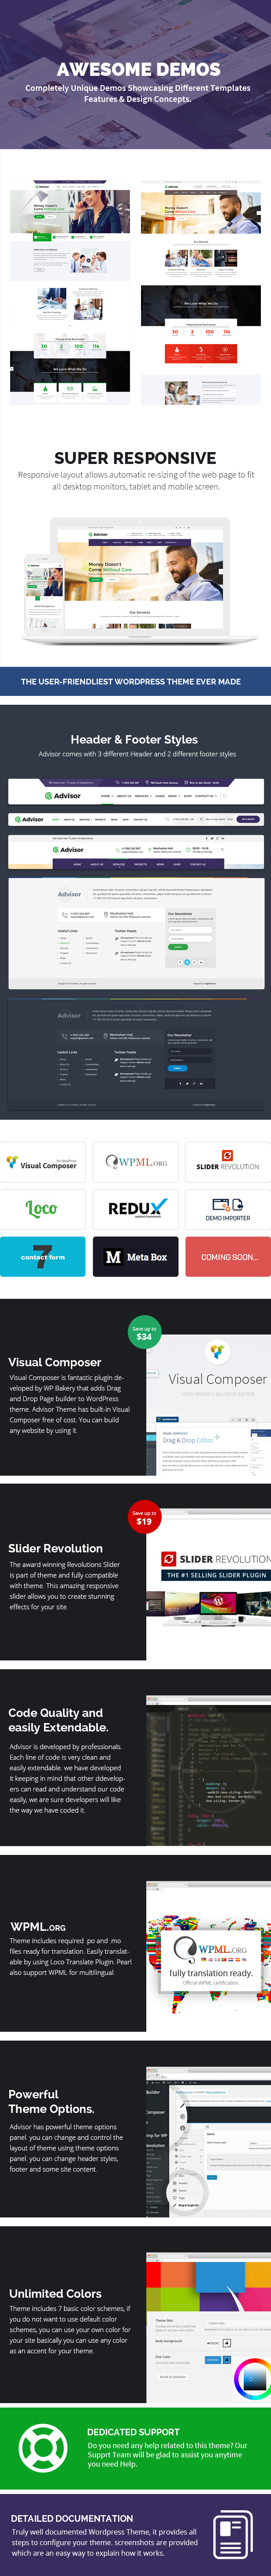 Advisor | Consulting, Business, Finance WordPress Theme - 6